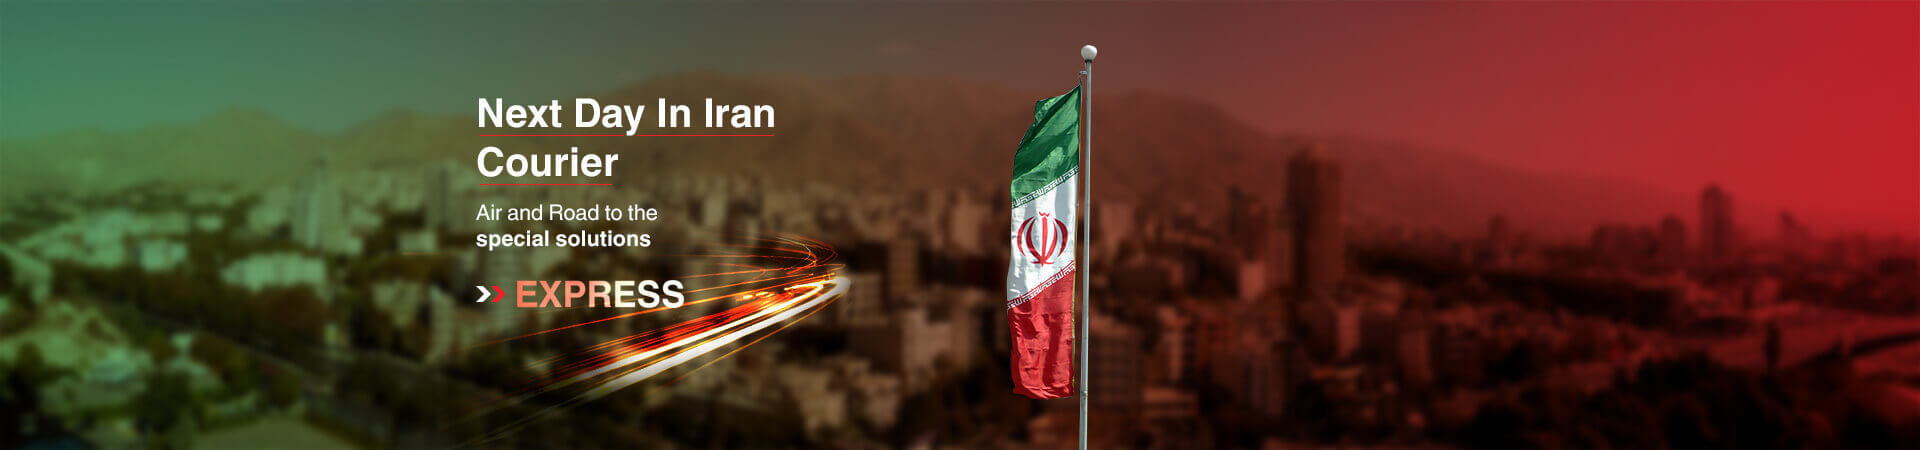 Next Day Iran..